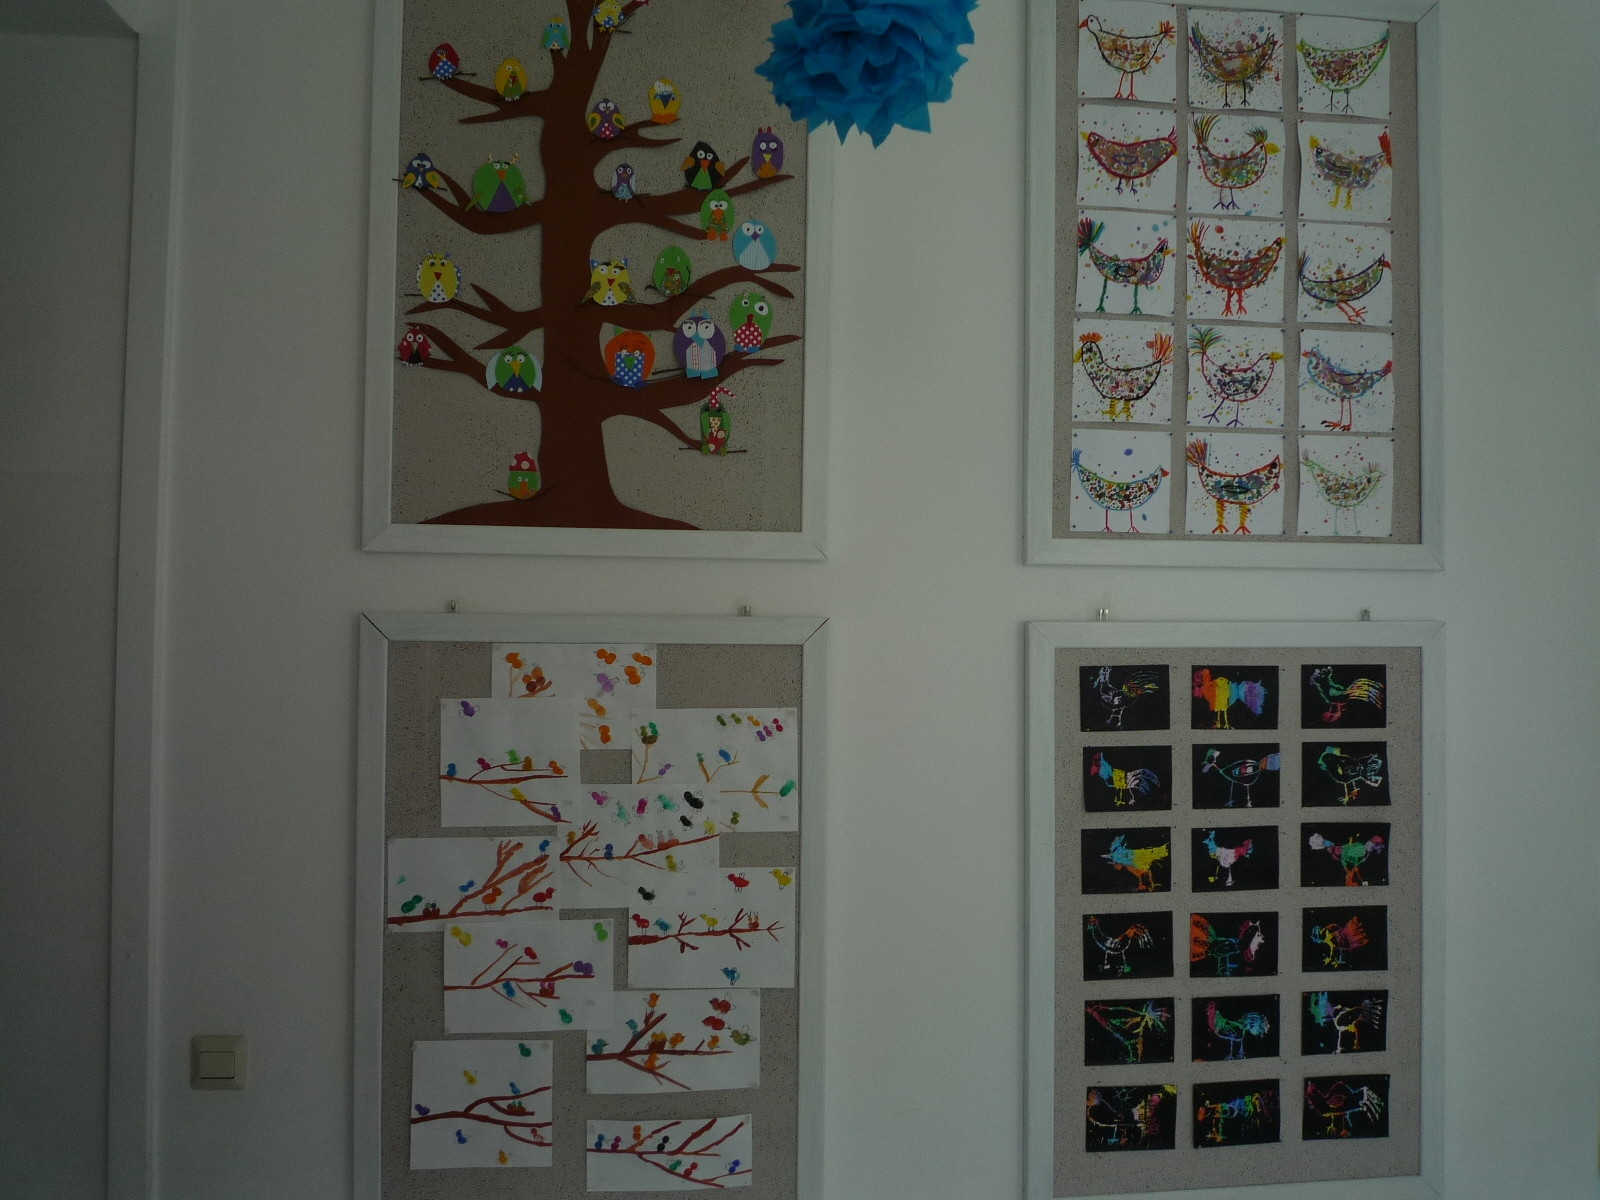 Jahrgangsübergreifendes Thema: Vögel in verschiedenen Technniken, alle Klassen